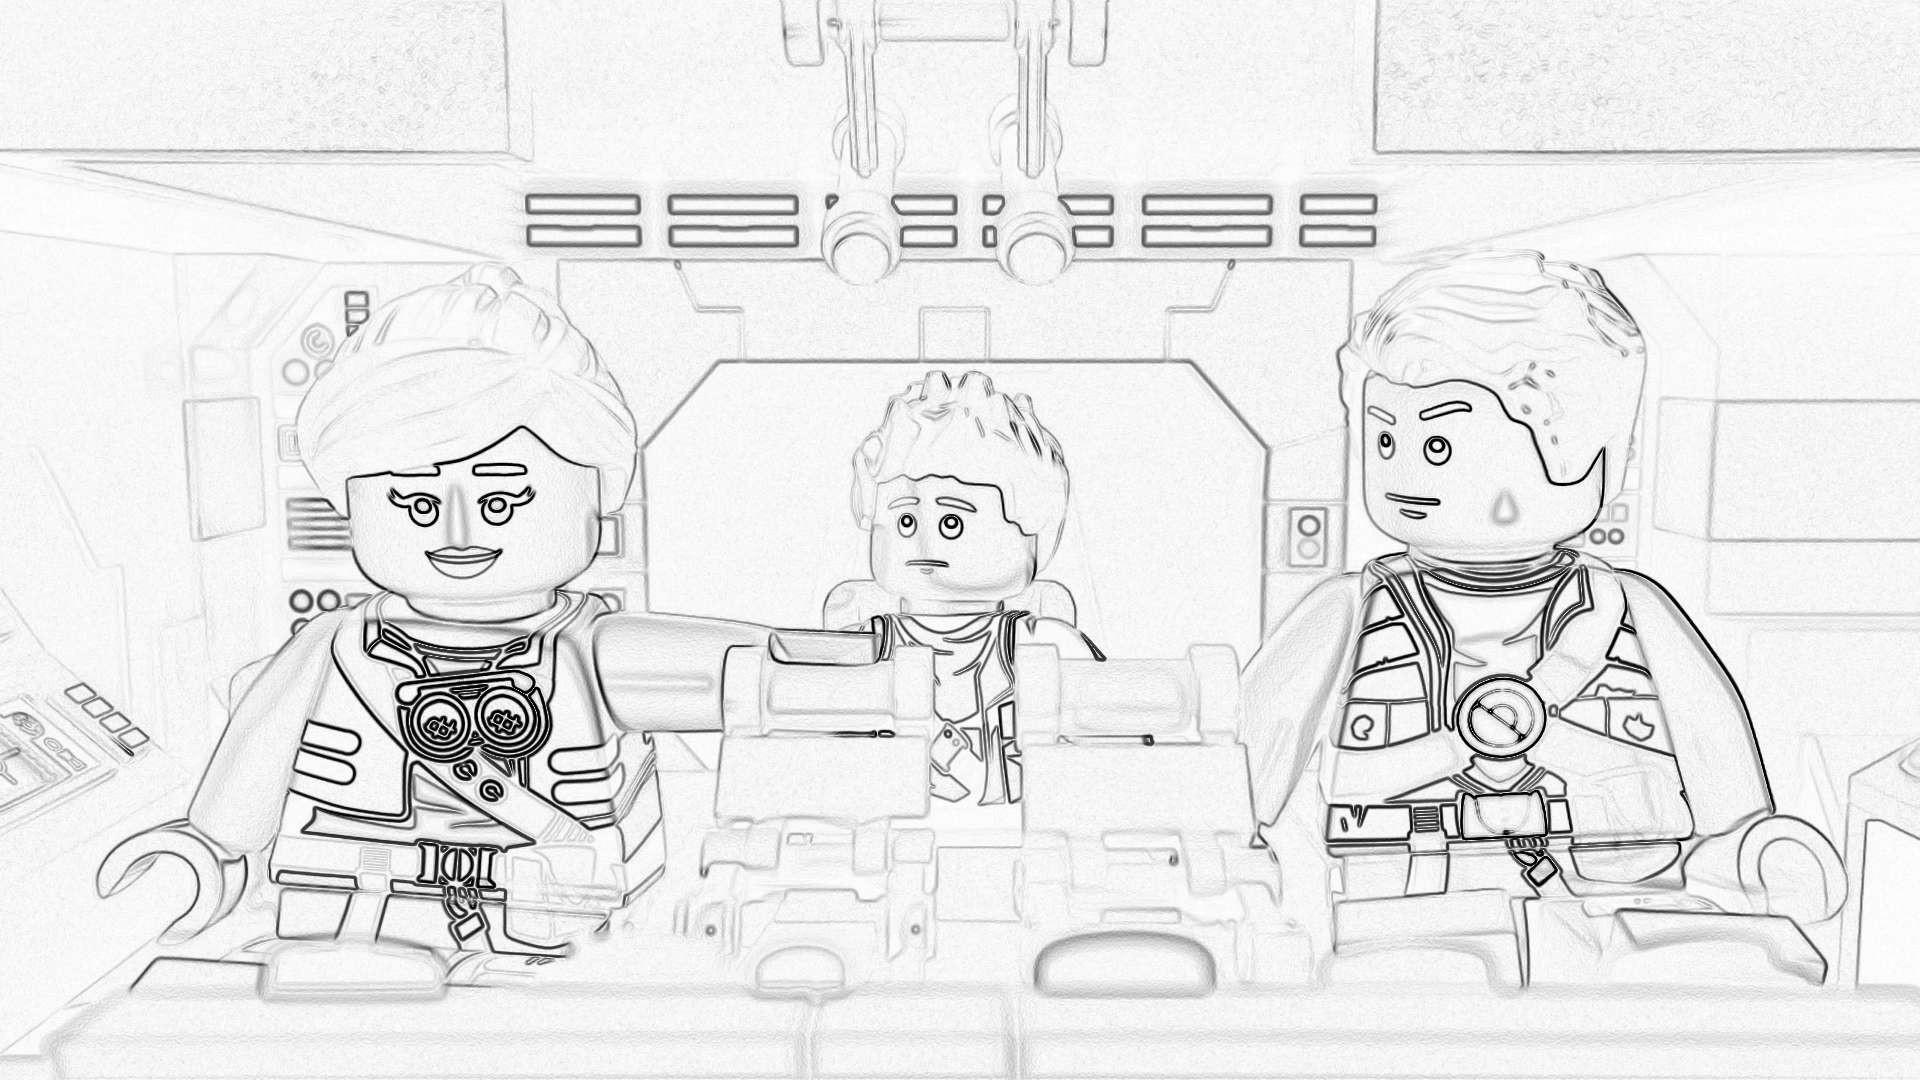 Lego Star Wars Ausmalbilder Genial Lego Starwars Coloring Pages Christmas Coloring Pages Lego Schön Stock